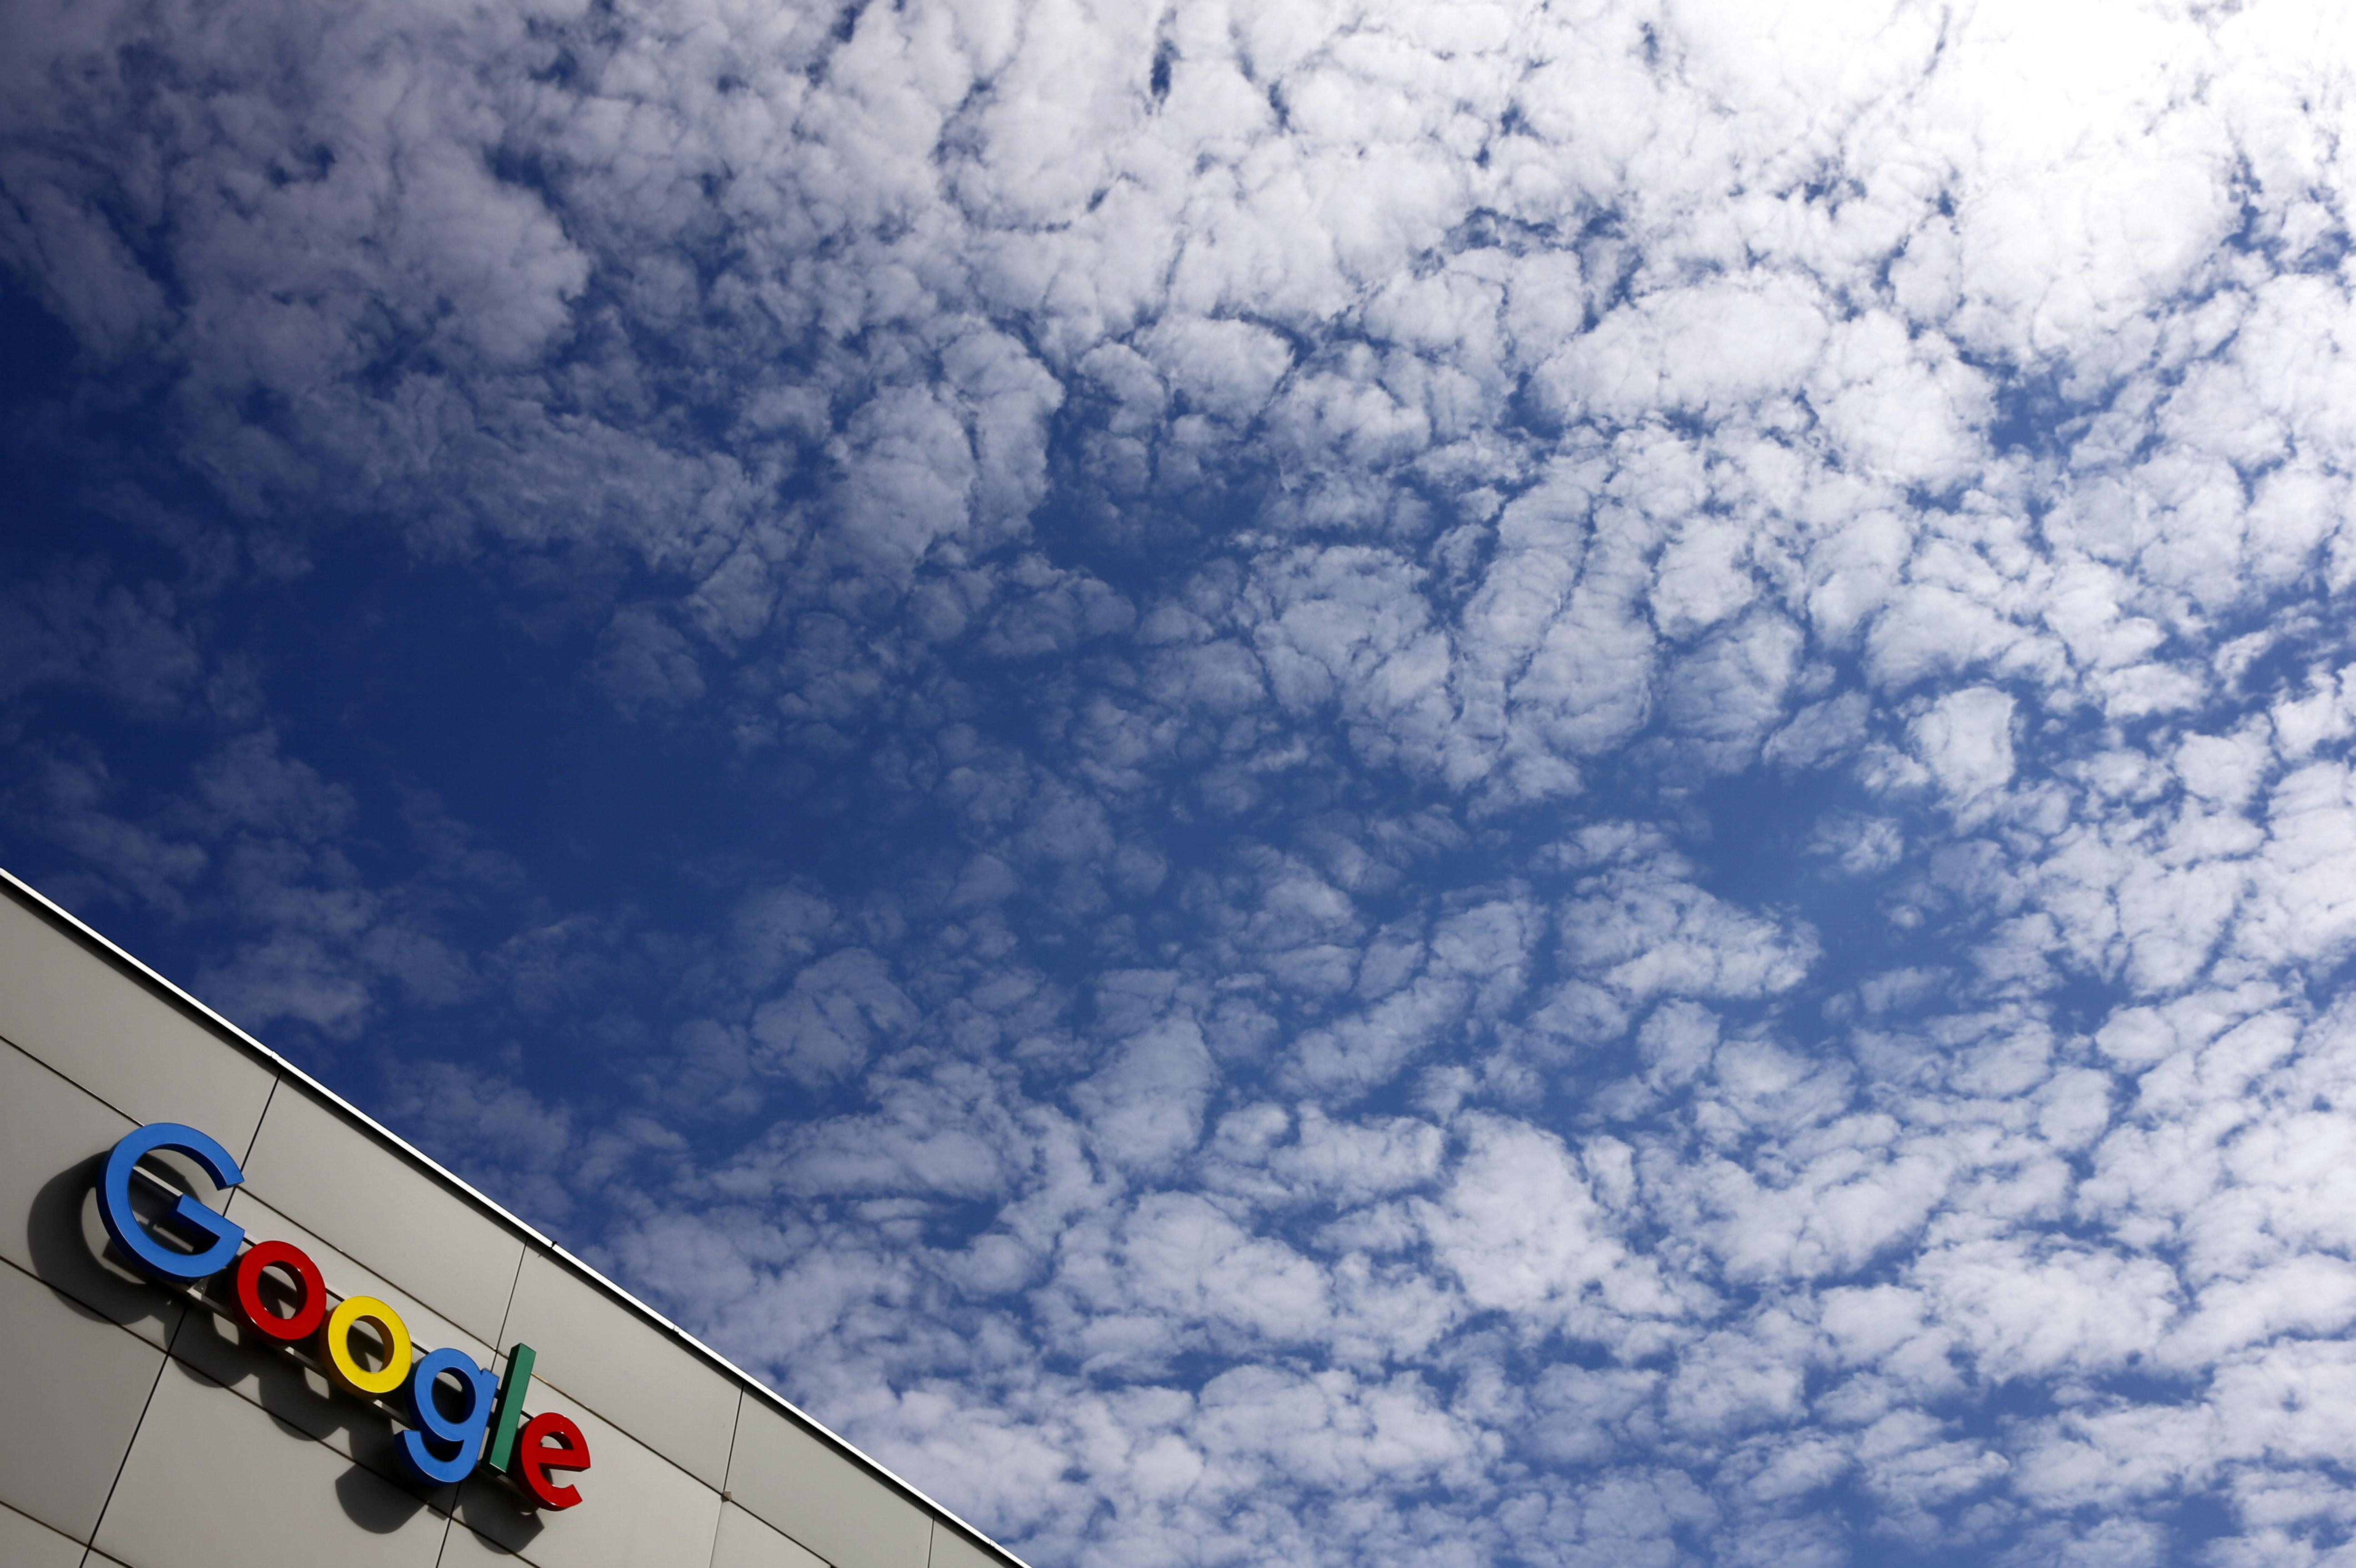 A logo of Google is seen at an office building in Zurich, Switzerland July 1, 2020.   REUTERS/Arnd Wiegmann - RC2AKH9F0TVI